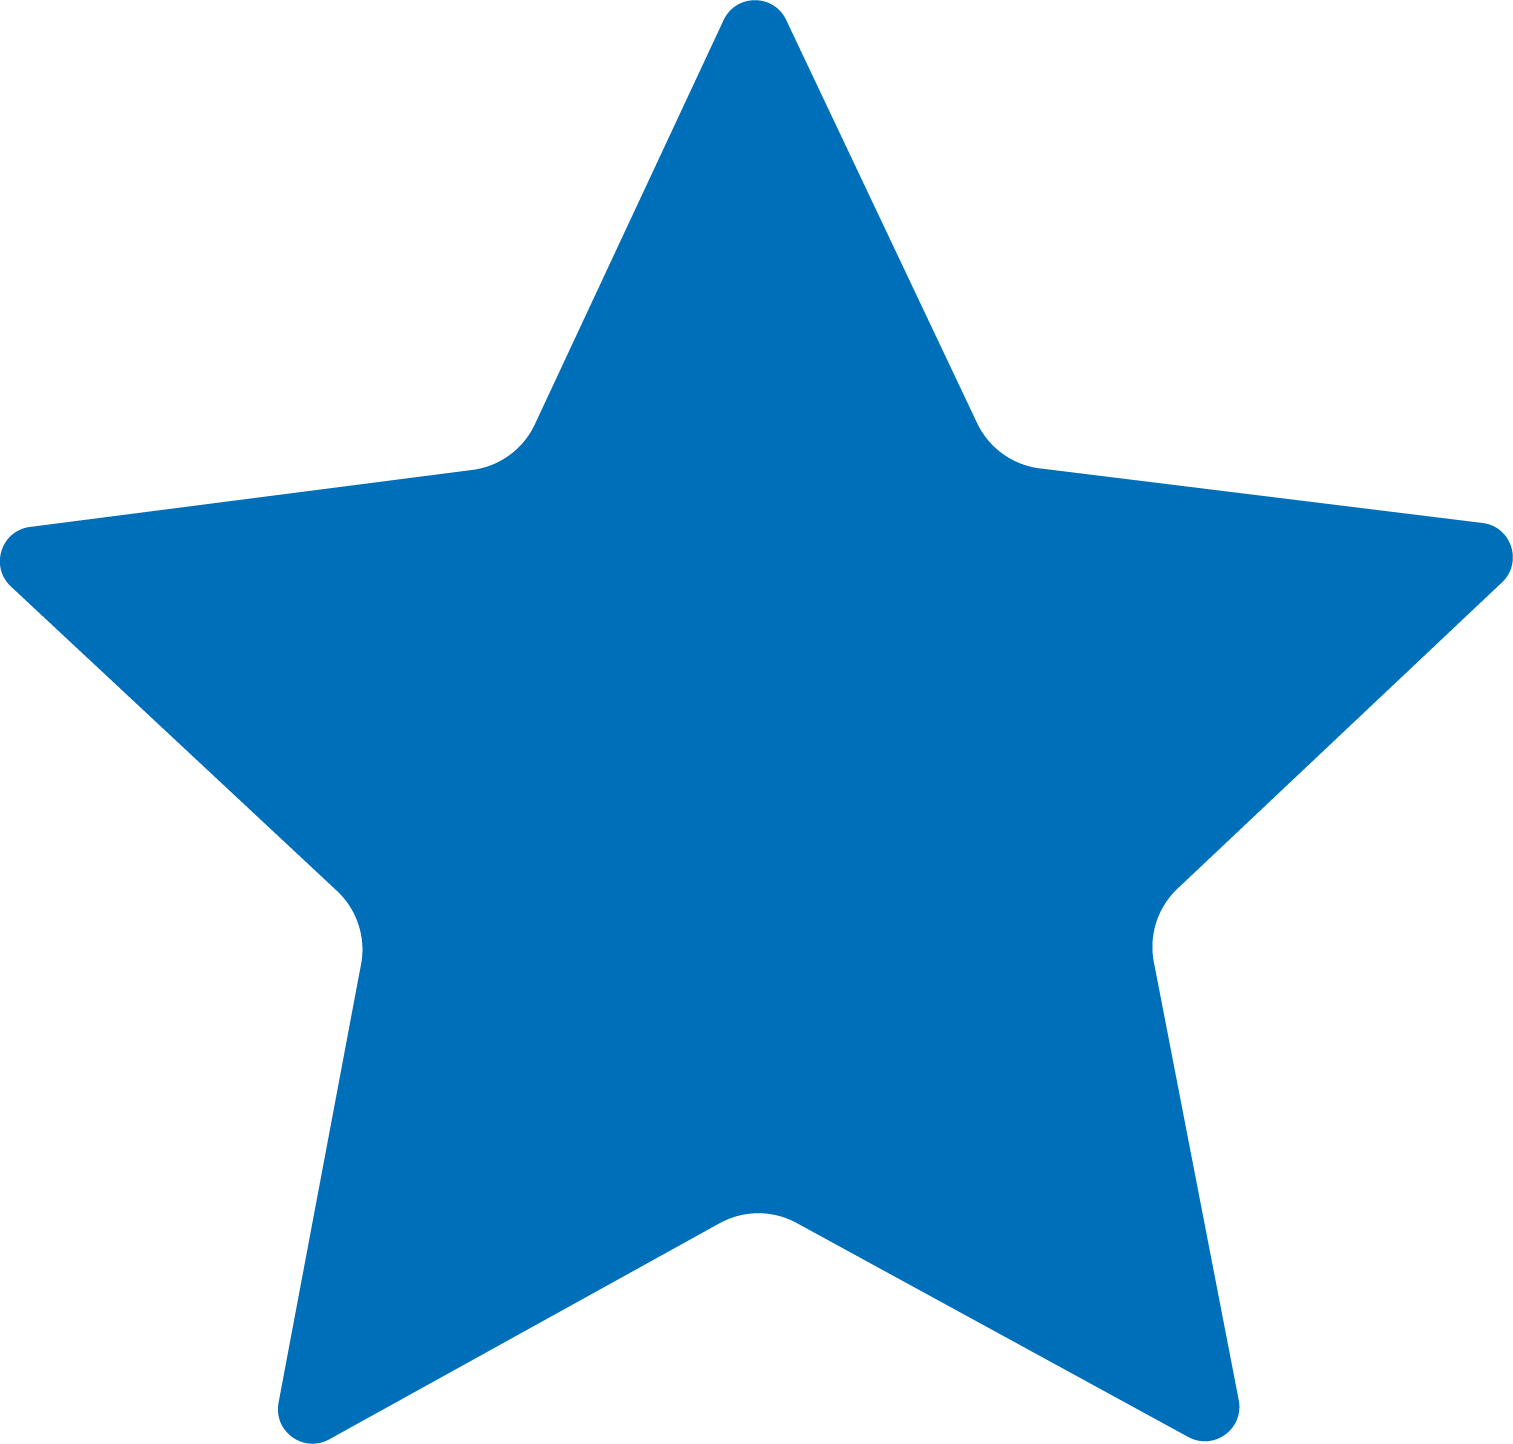 MAW-star-cmyk-c_82753[1].png